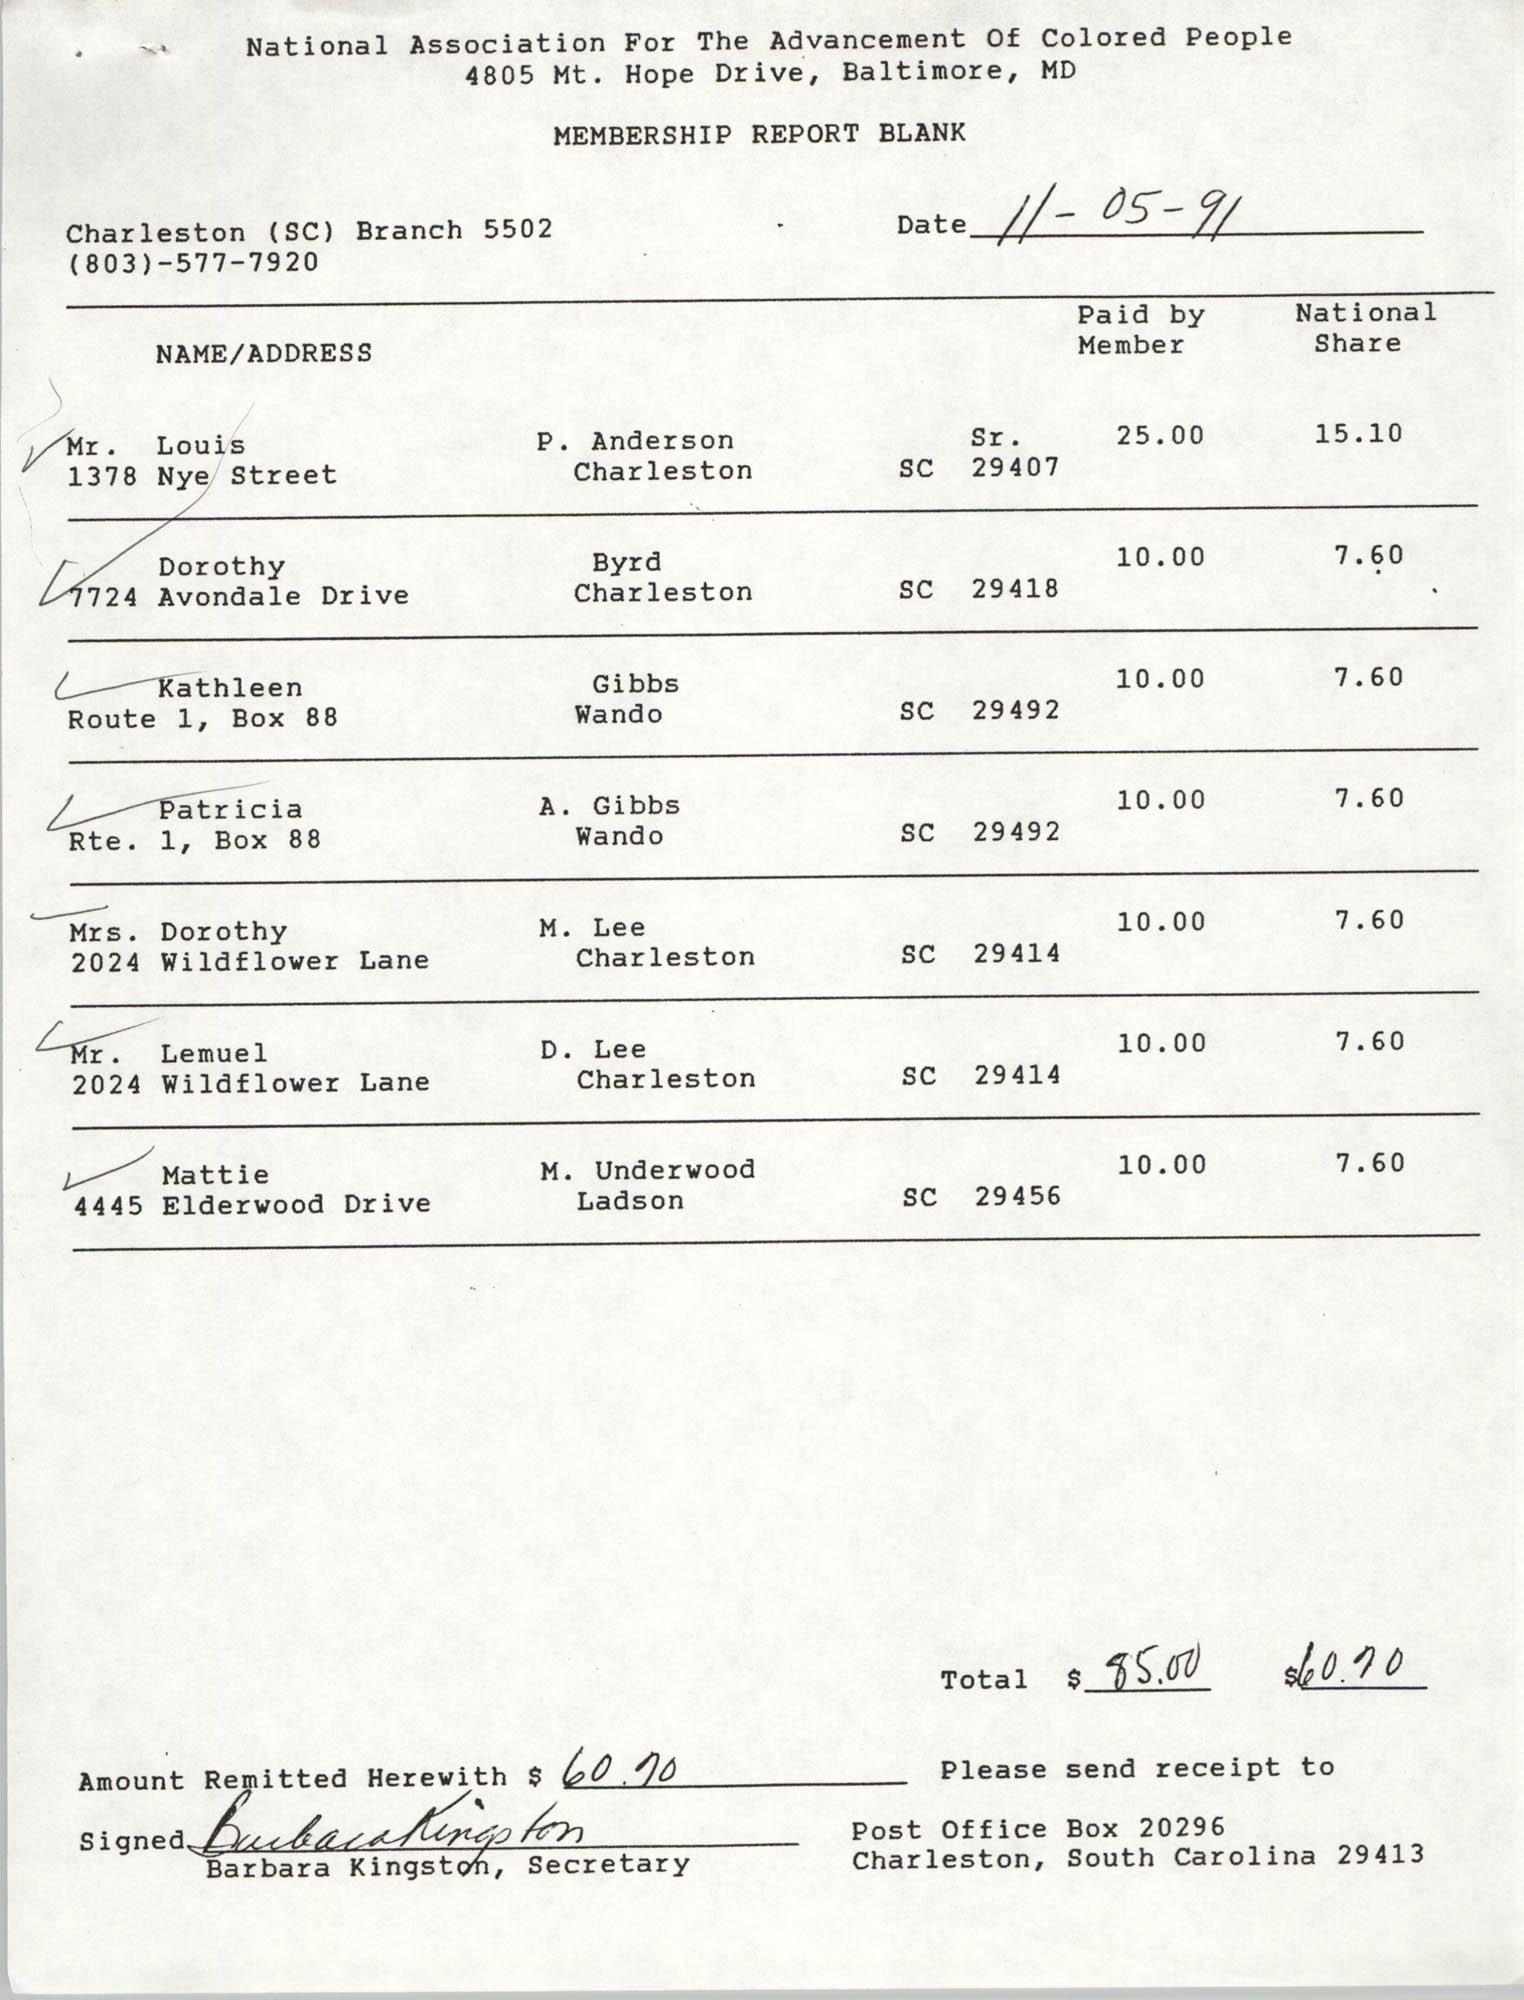 Membership Report Blank, Charleston Branch of the NAACP, Barbara Kingston, November 5, 1991